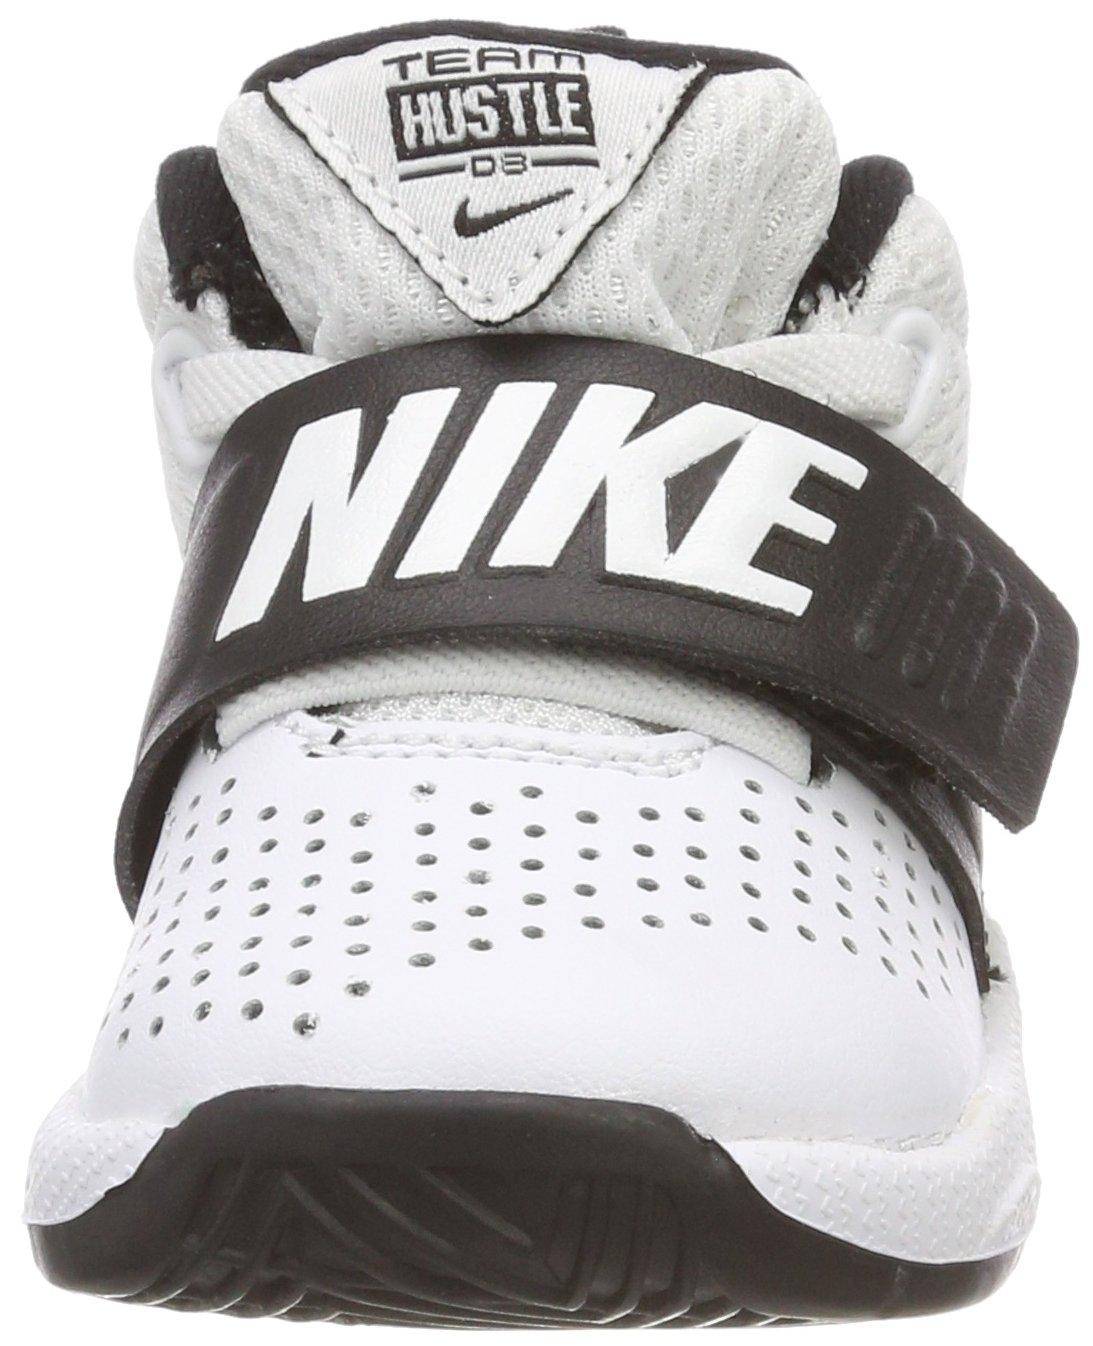 Nike White Team Hustle D Toddler Shoe AQ9976